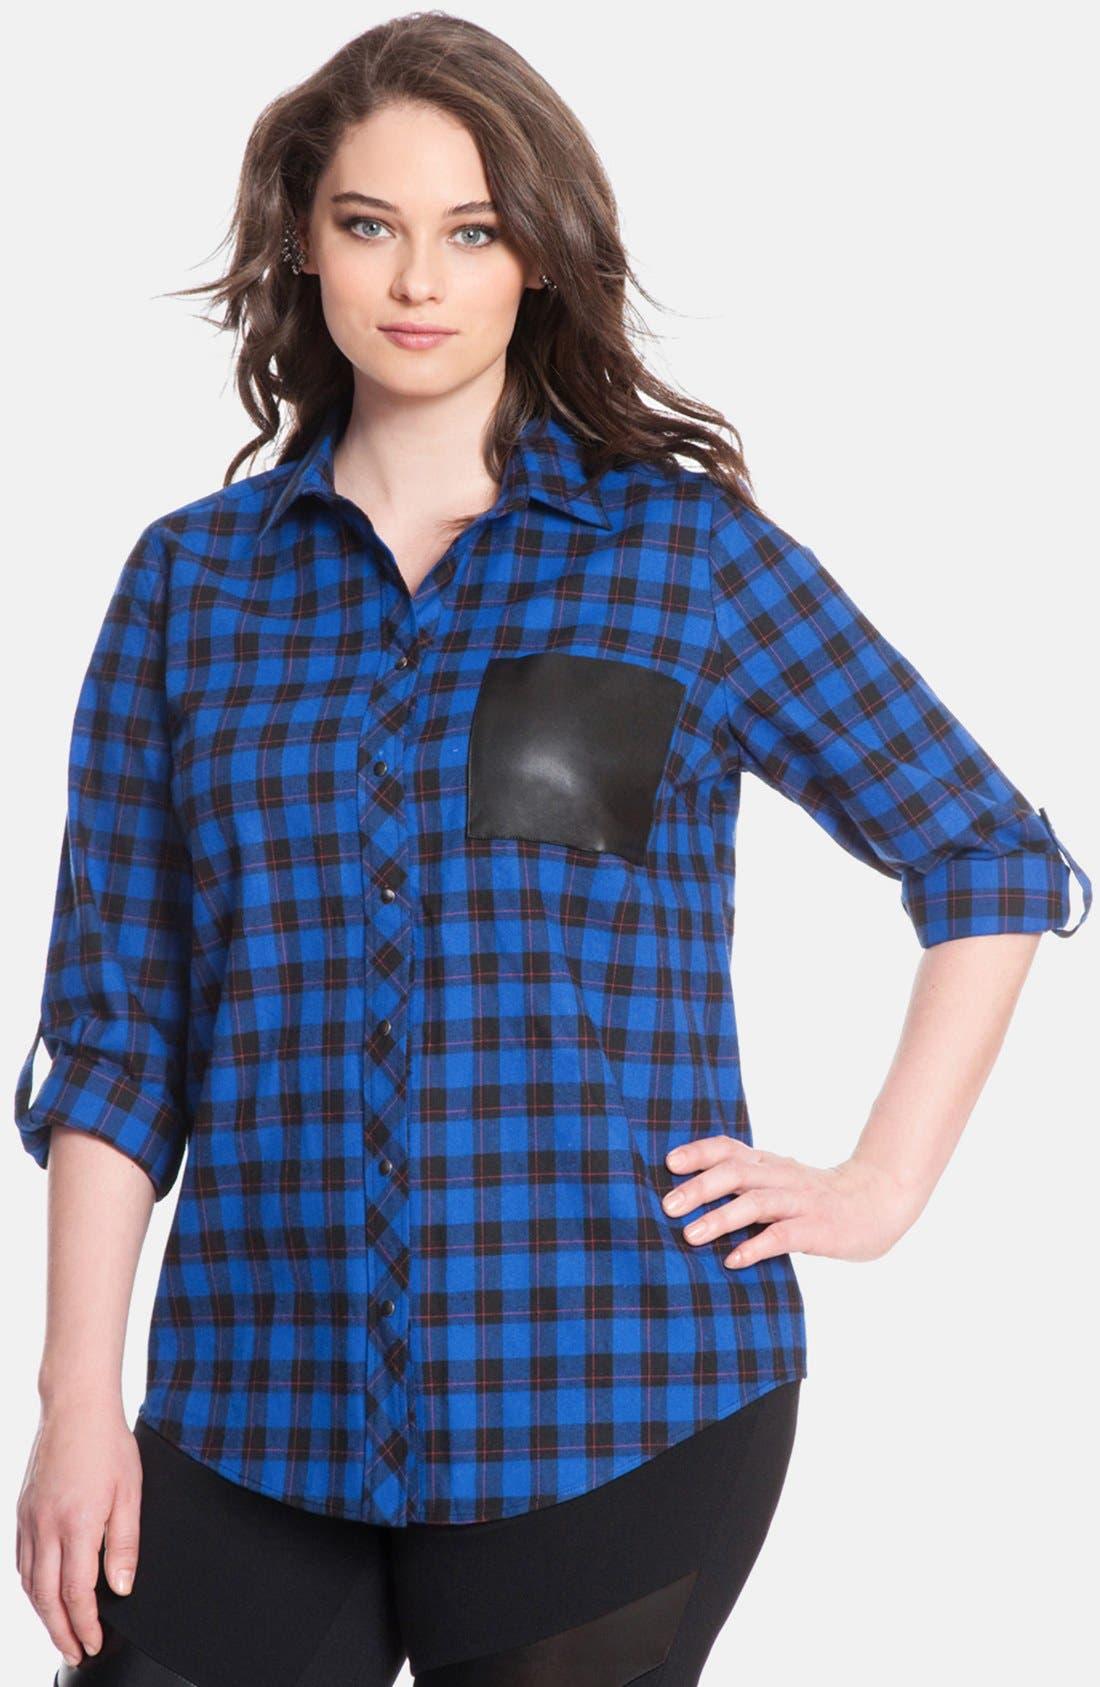 Alternate Image 1 Selected - ELOQUII Plaid Cotton Flannel Shirt (Plus Size)